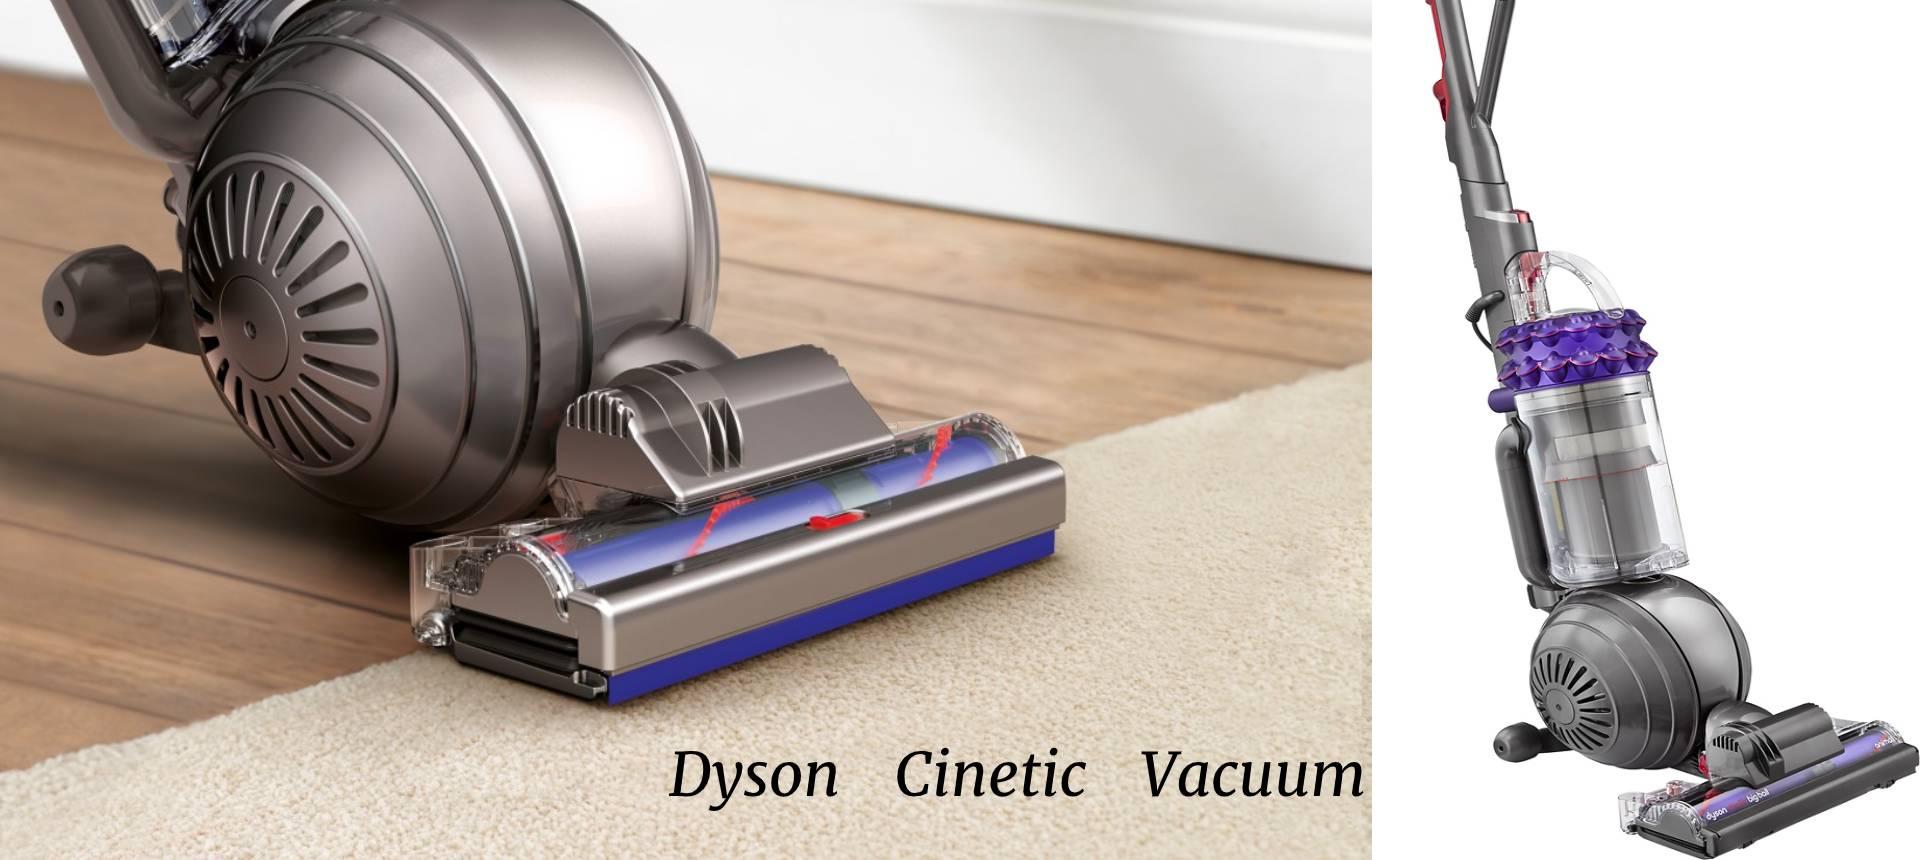 Dyson Cinetic Vacuum